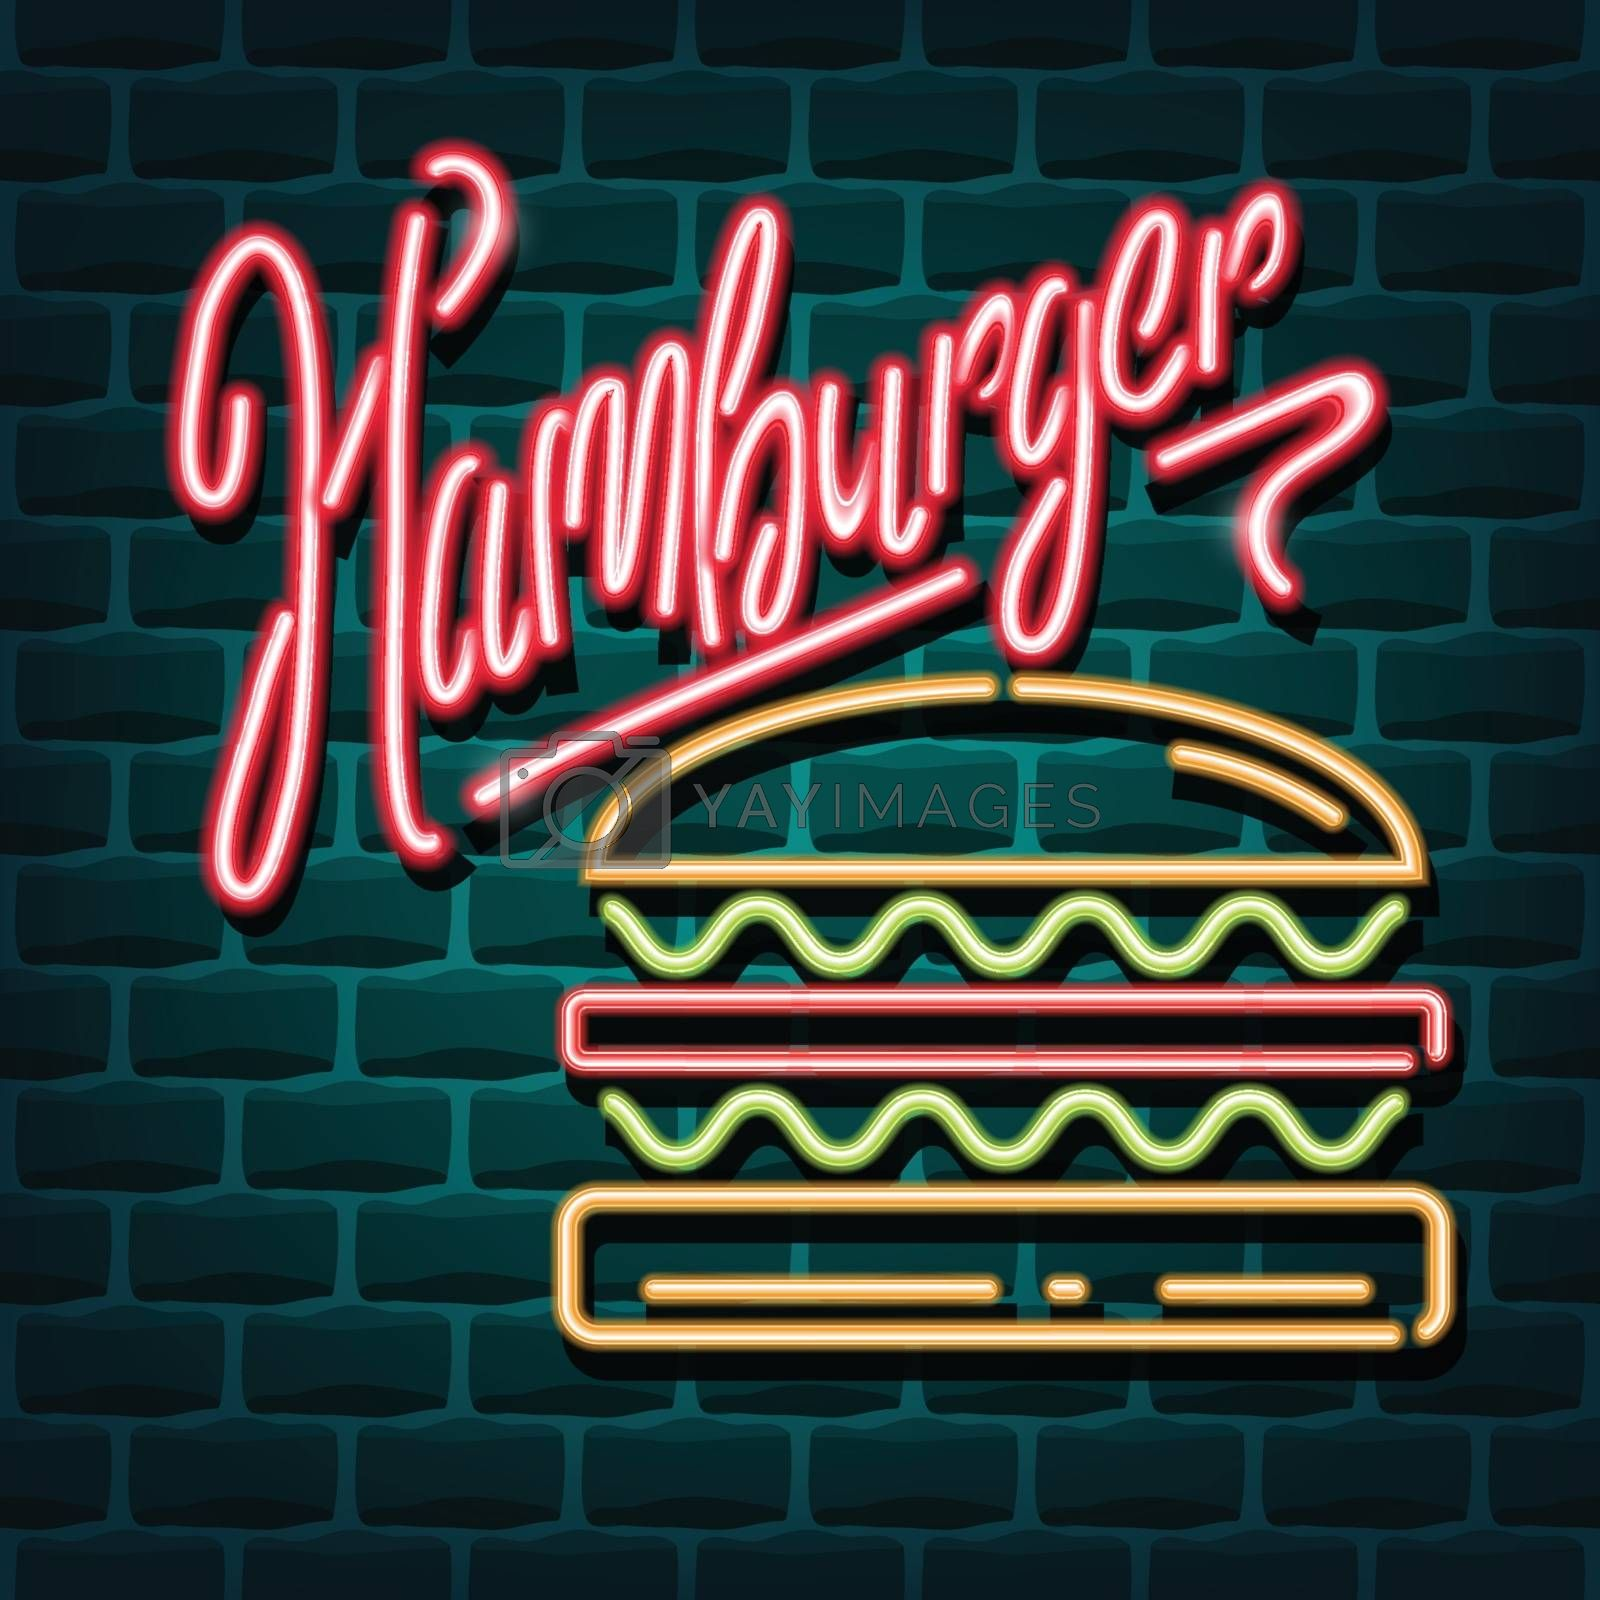 hamburger neon advertising sign. Vector